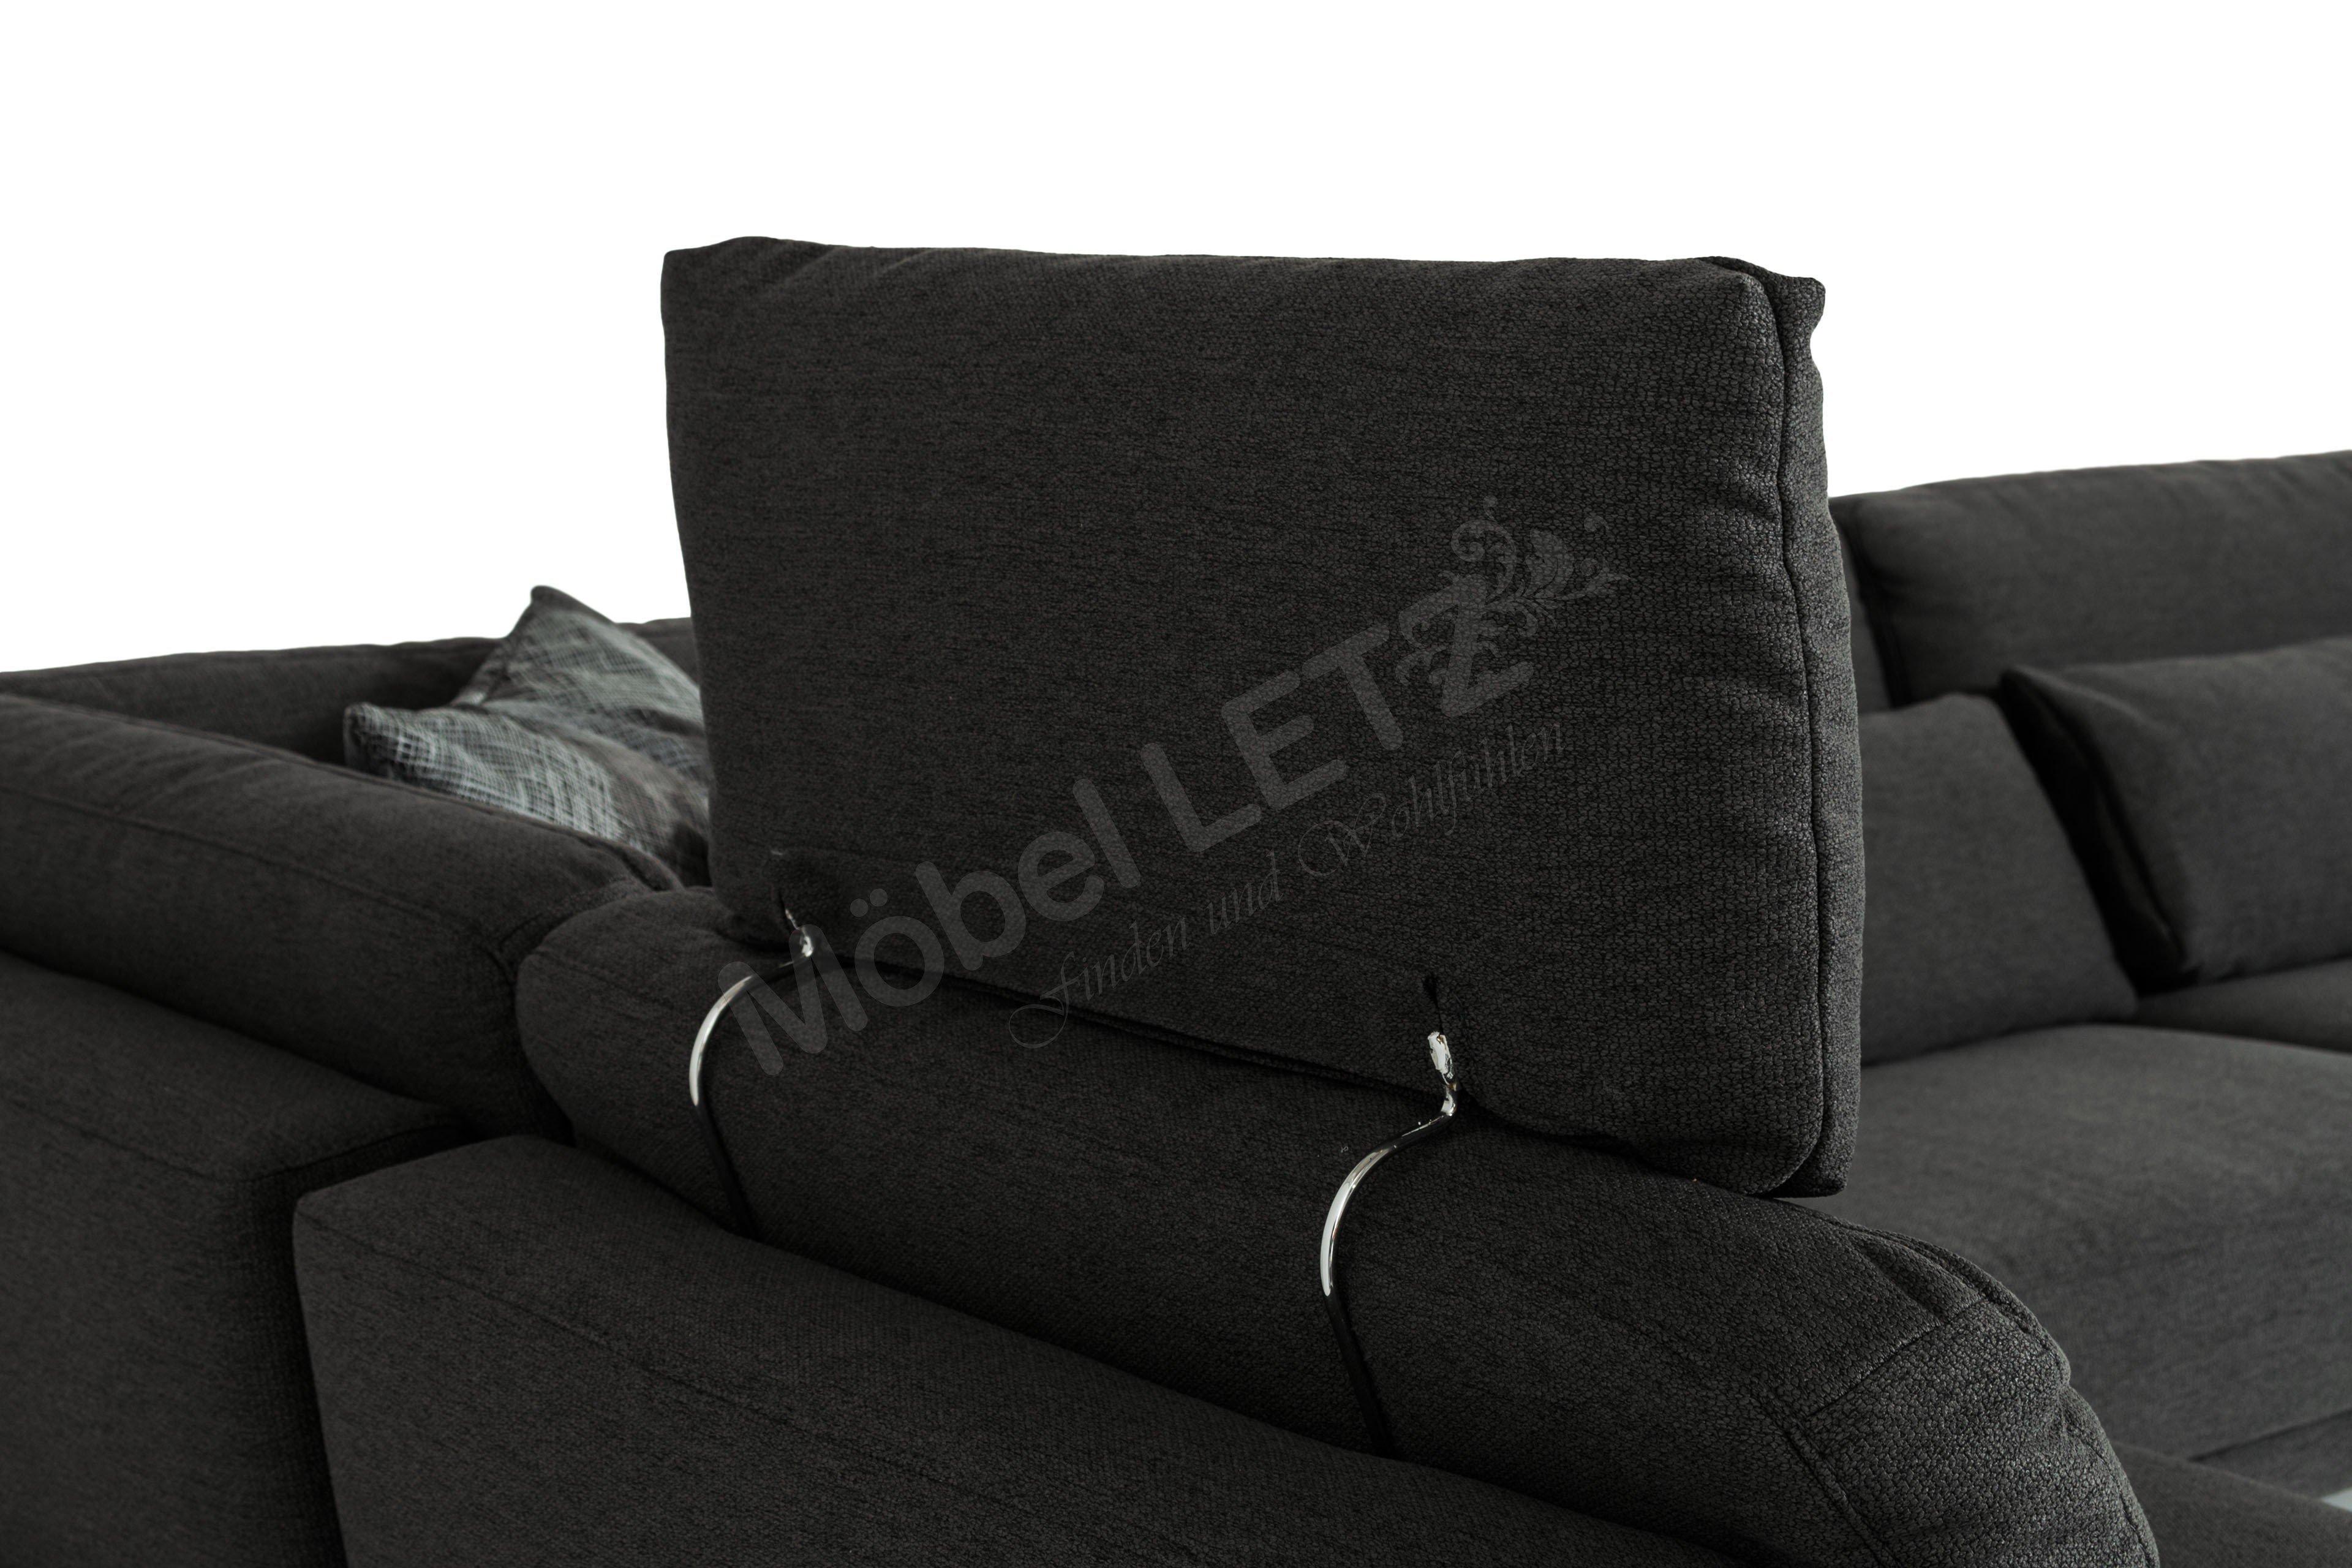 k w polsterm bel melody 7266 couchgarnitur in anthrazit m bel letz ihr online shop. Black Bedroom Furniture Sets. Home Design Ideas